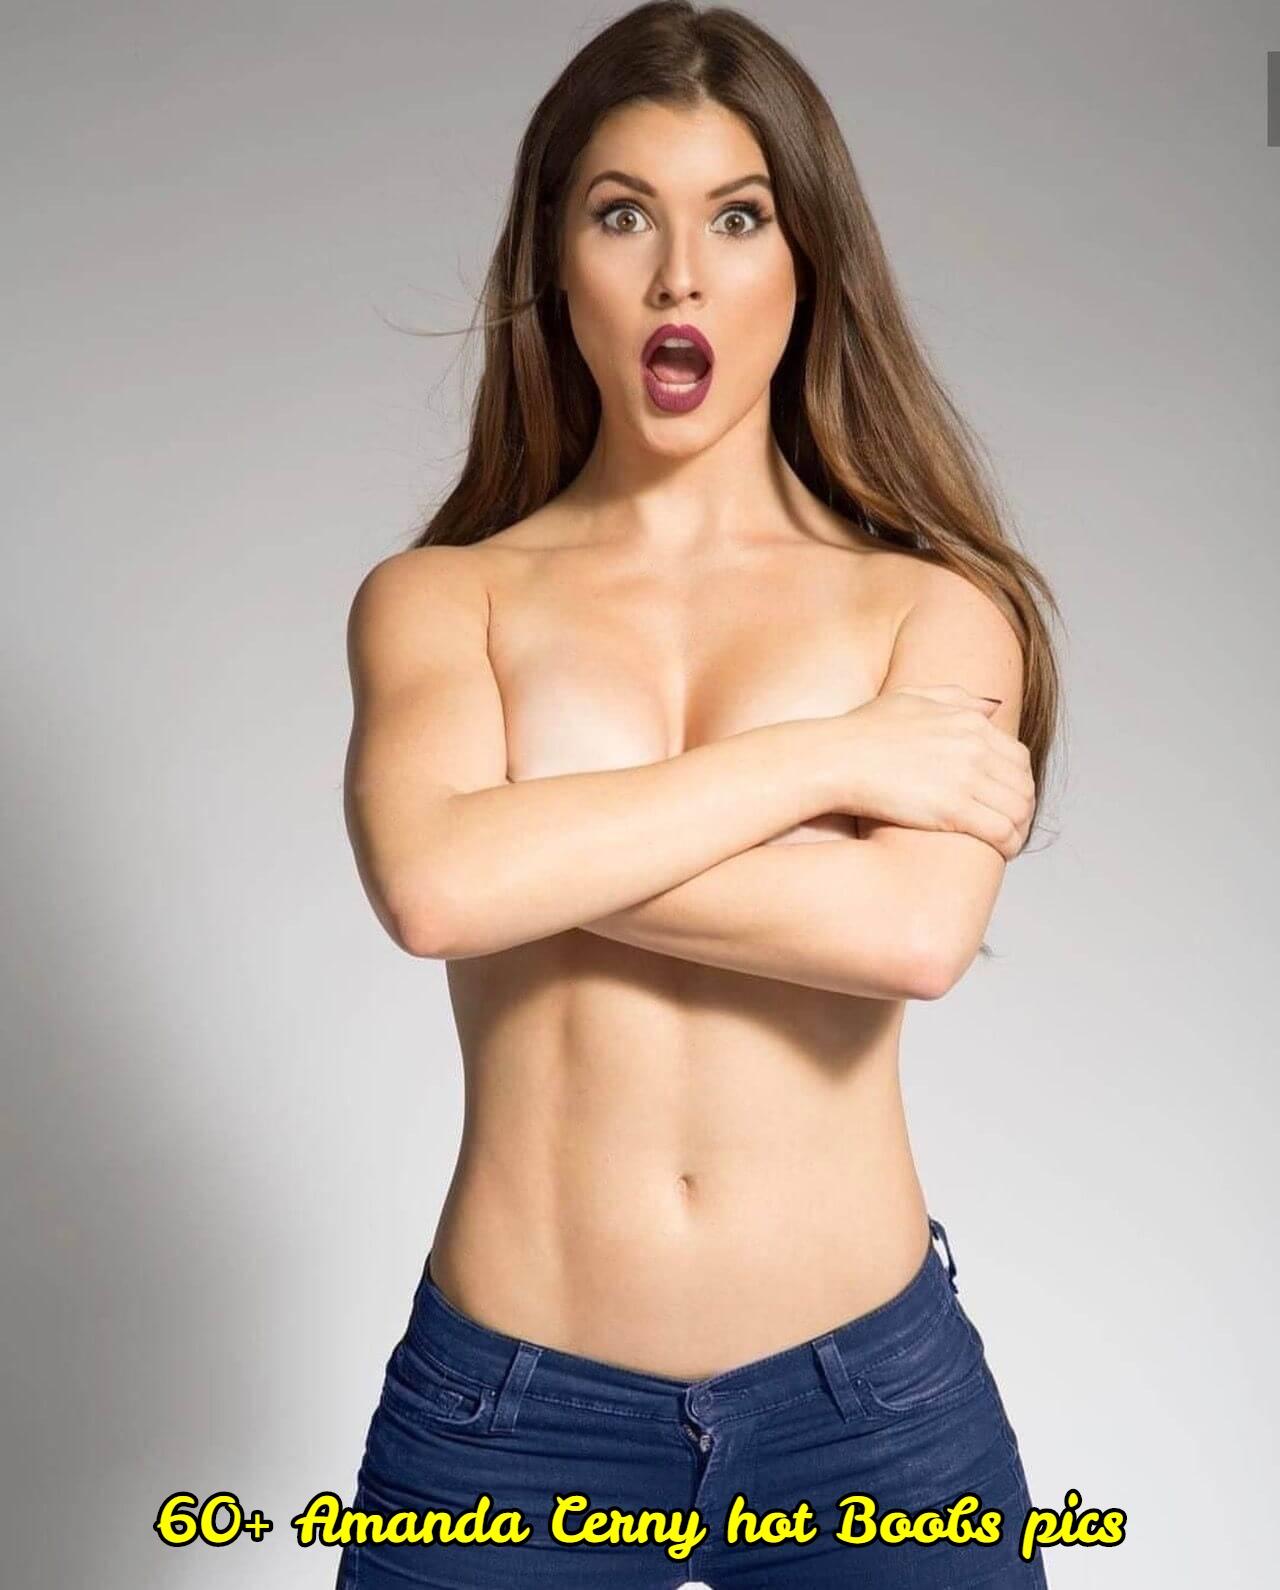 Amanda Cerny hot pictures